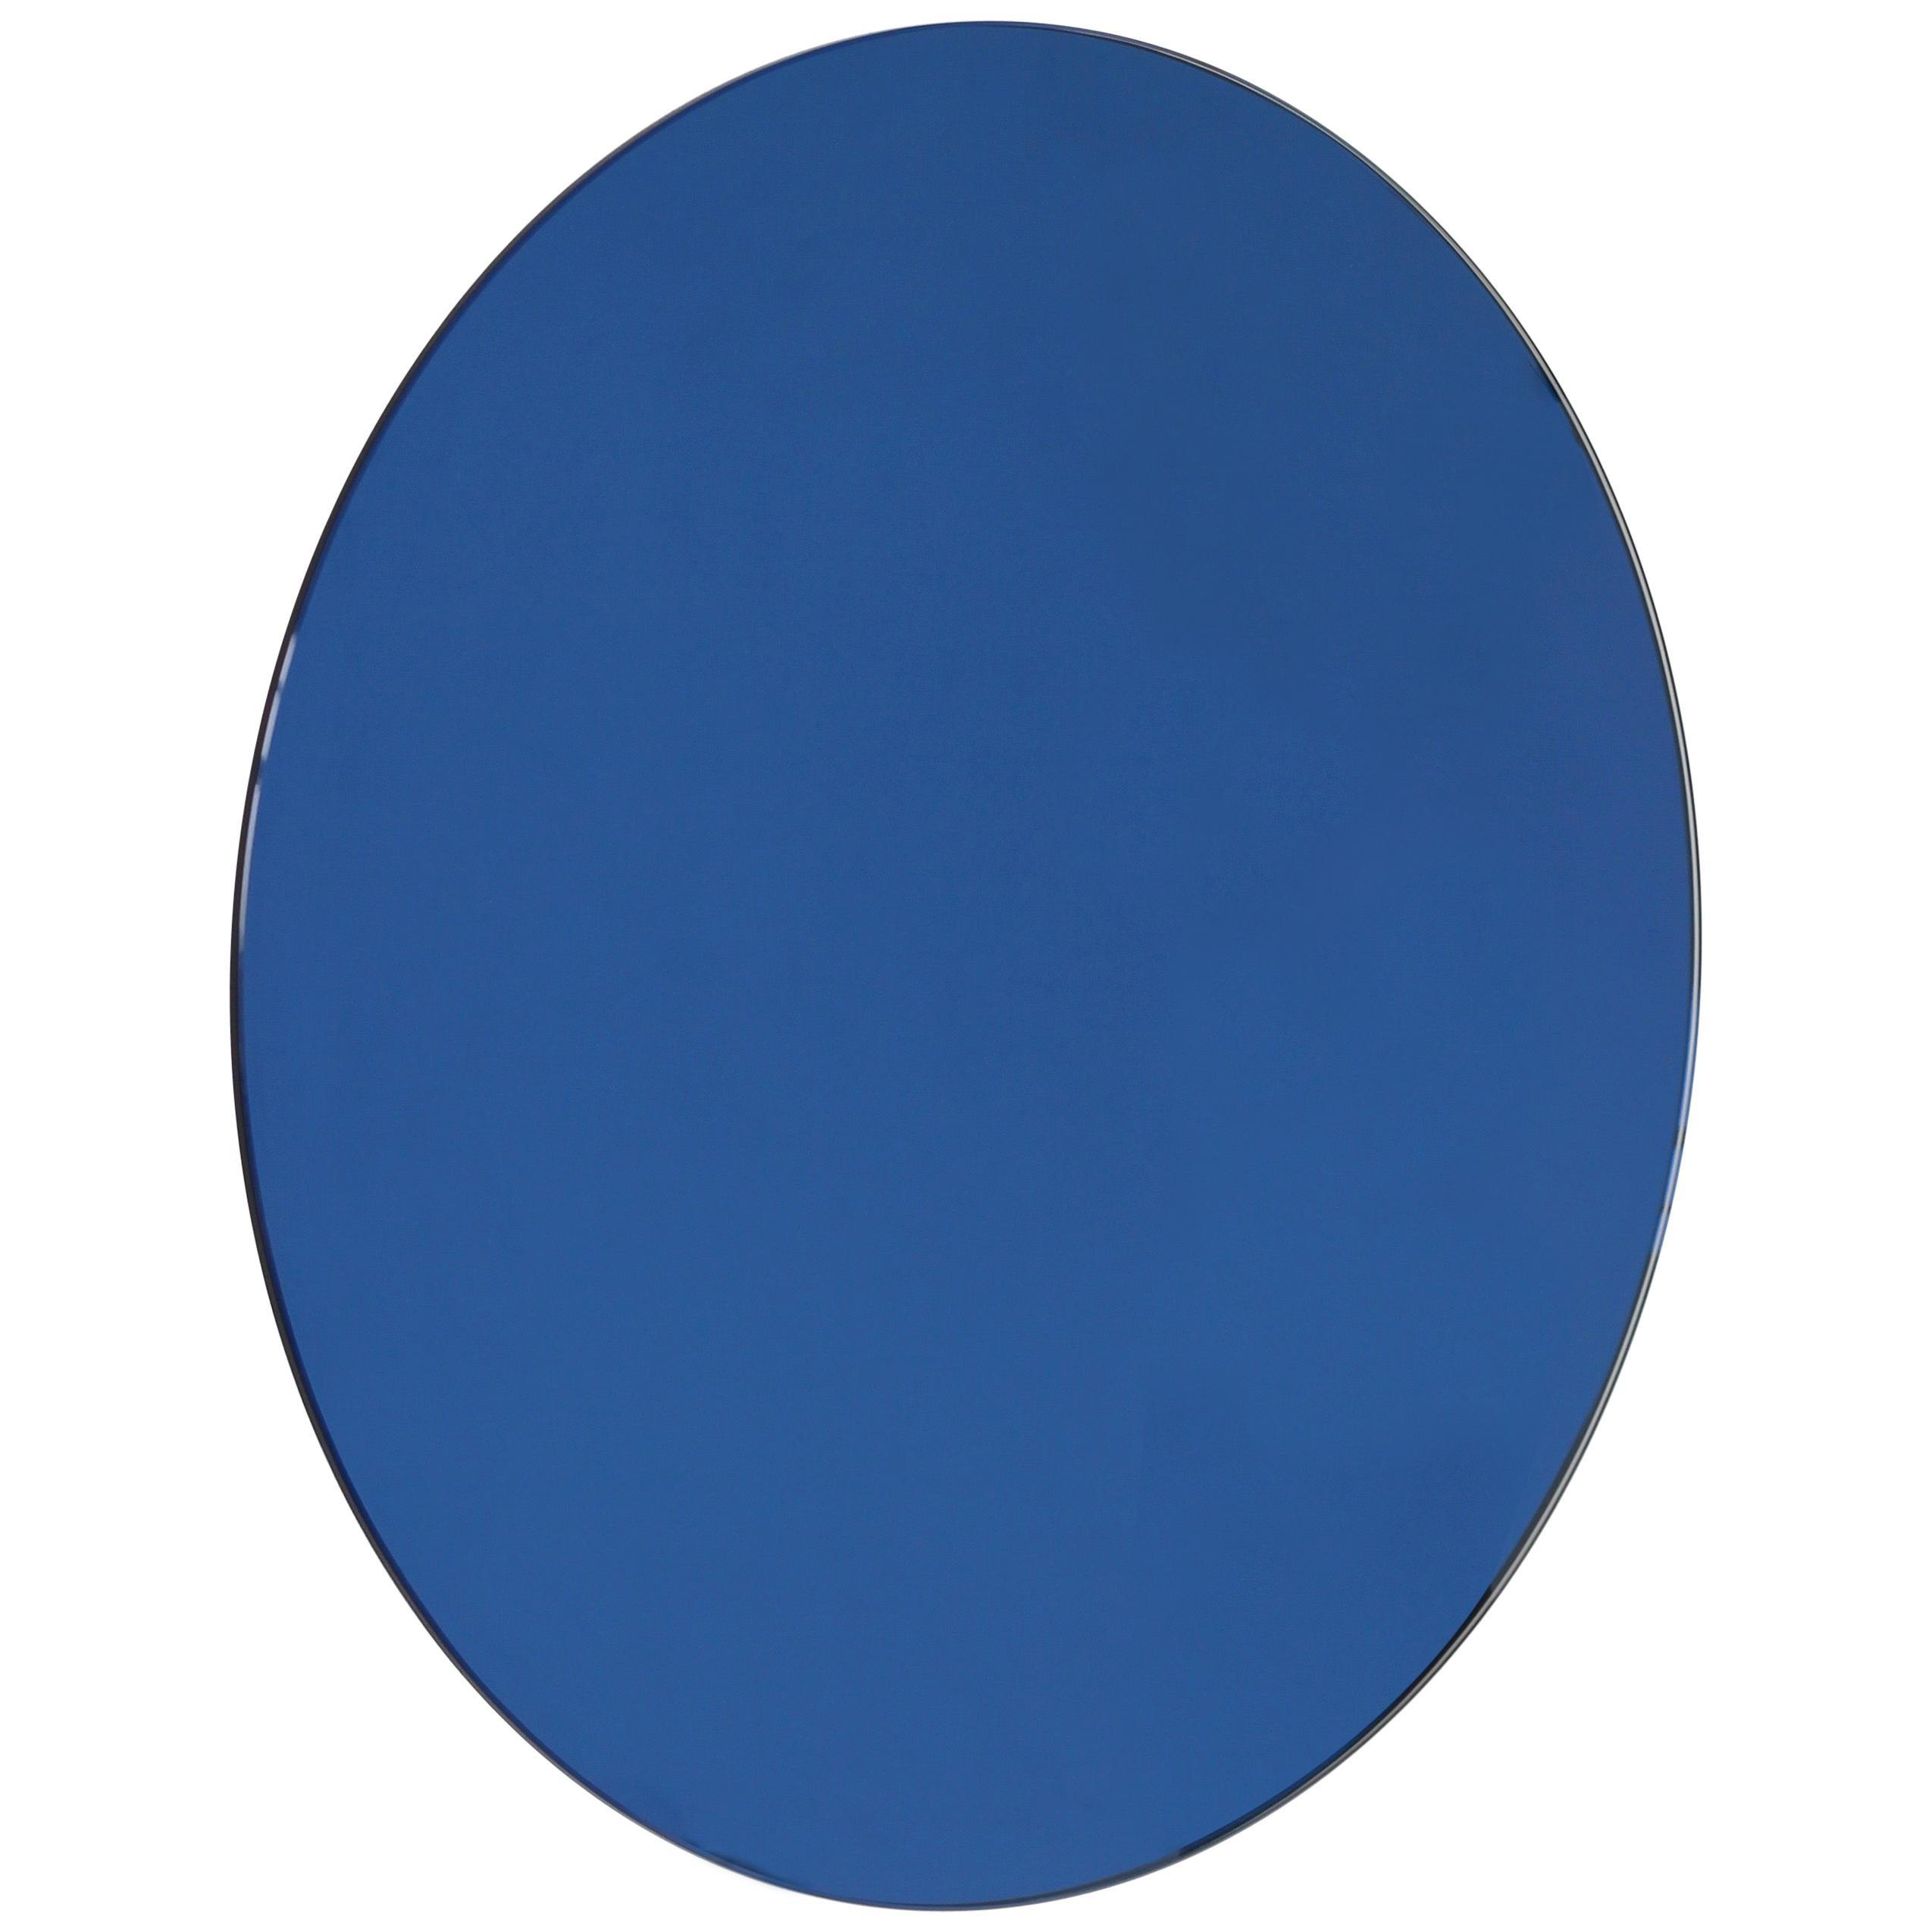 Orbis™ Blue Tinted Circular Minimalist Frameless Mirror - Large